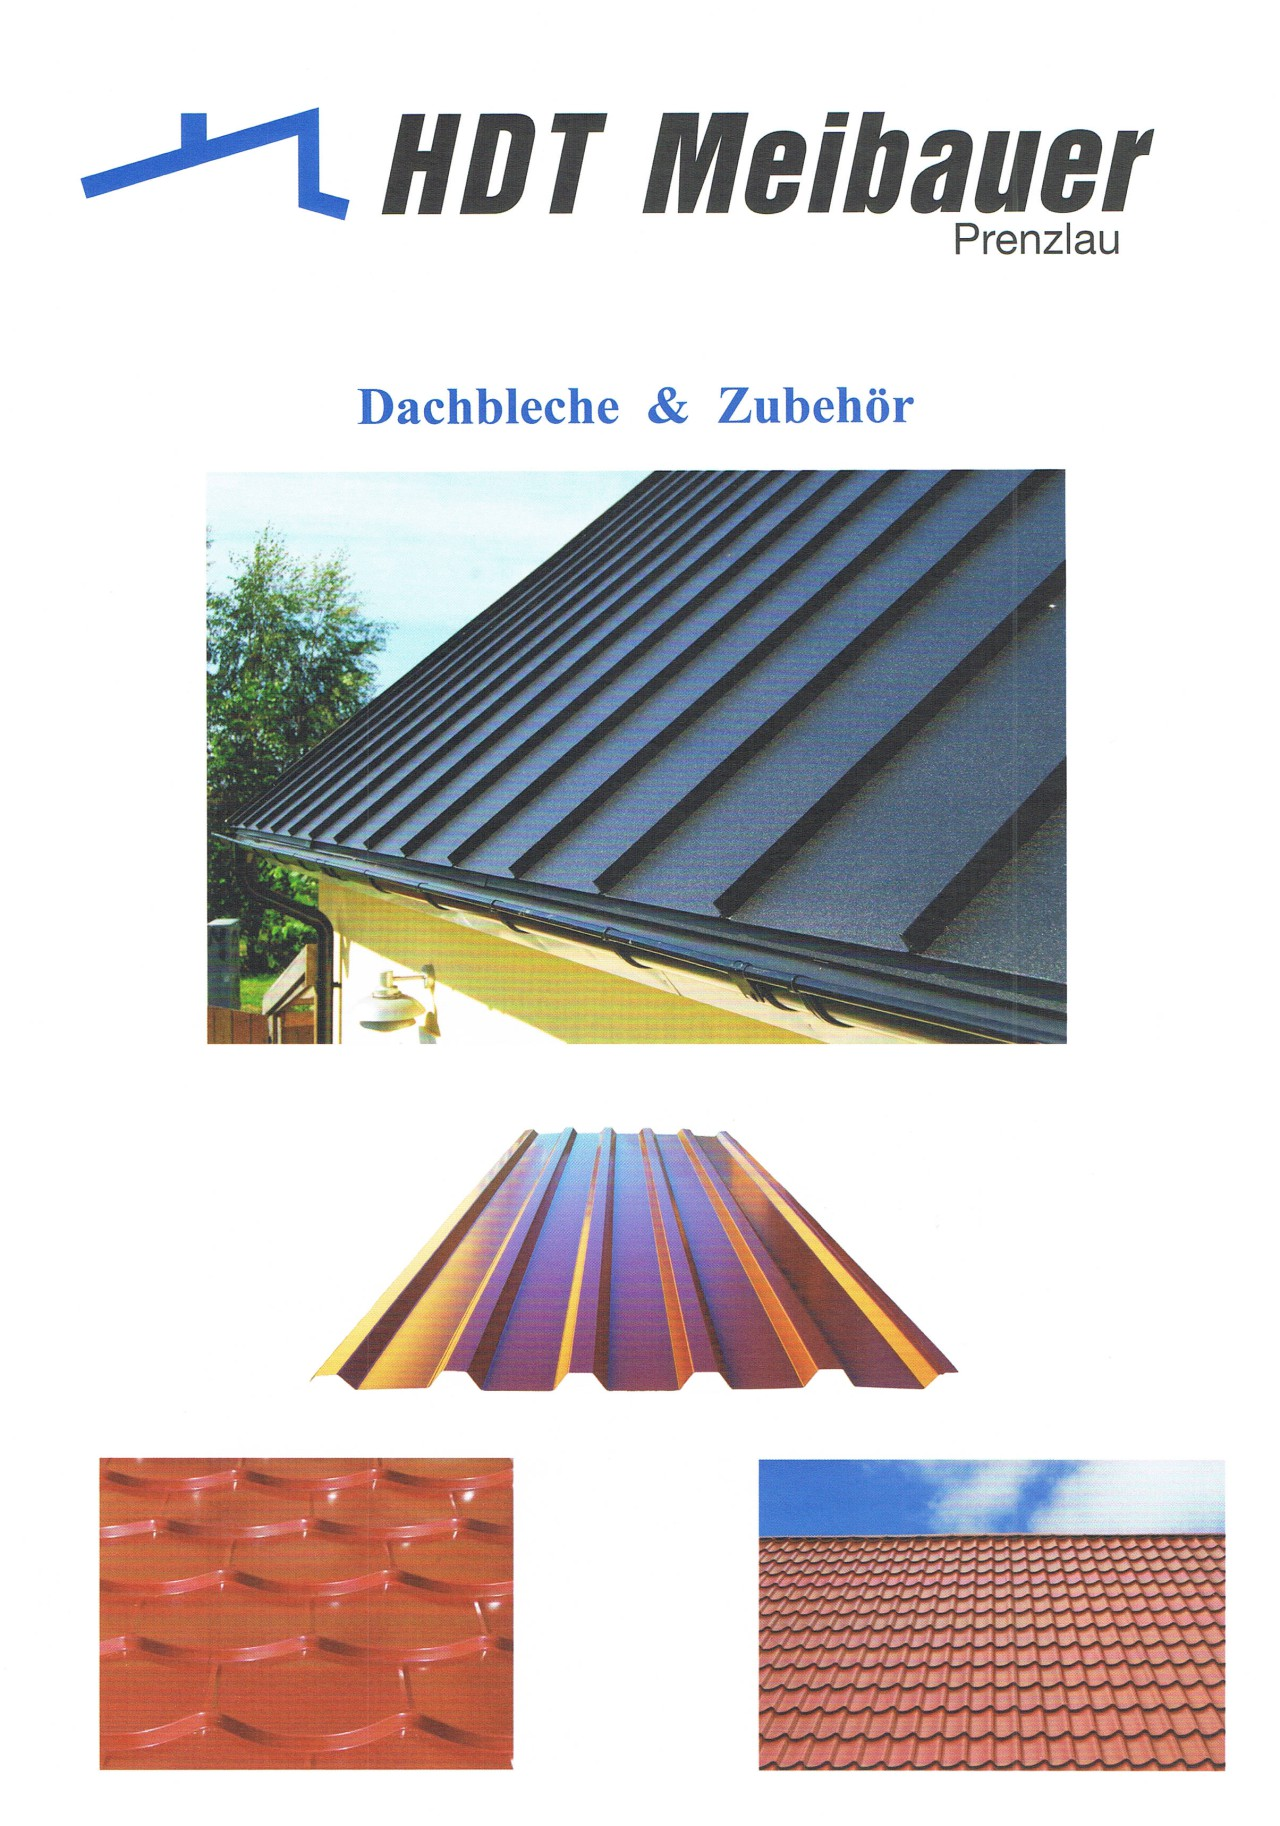 trapezblech trapezblech 2 wahl dach prenzlau profilbleche. Black Bedroom Furniture Sets. Home Design Ideas